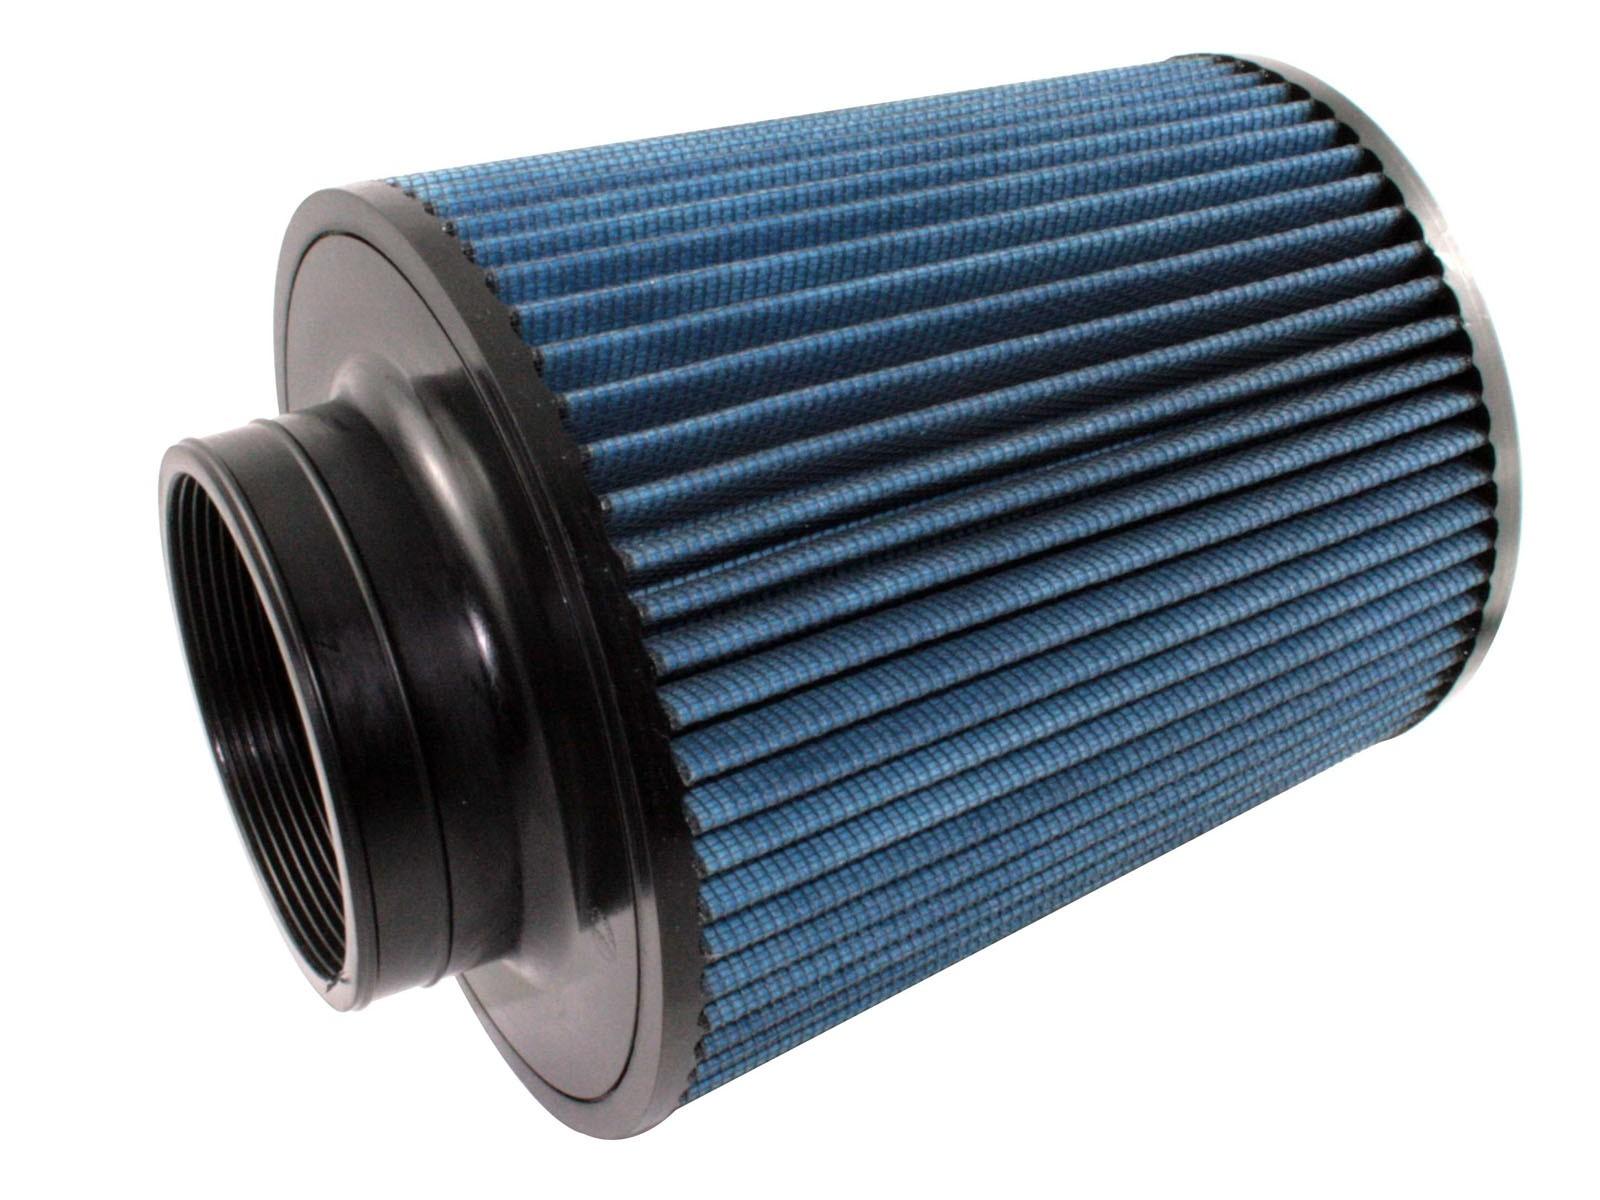 aFe POWER 24-91002 Magnum FLOW Pro 5R Air Filter